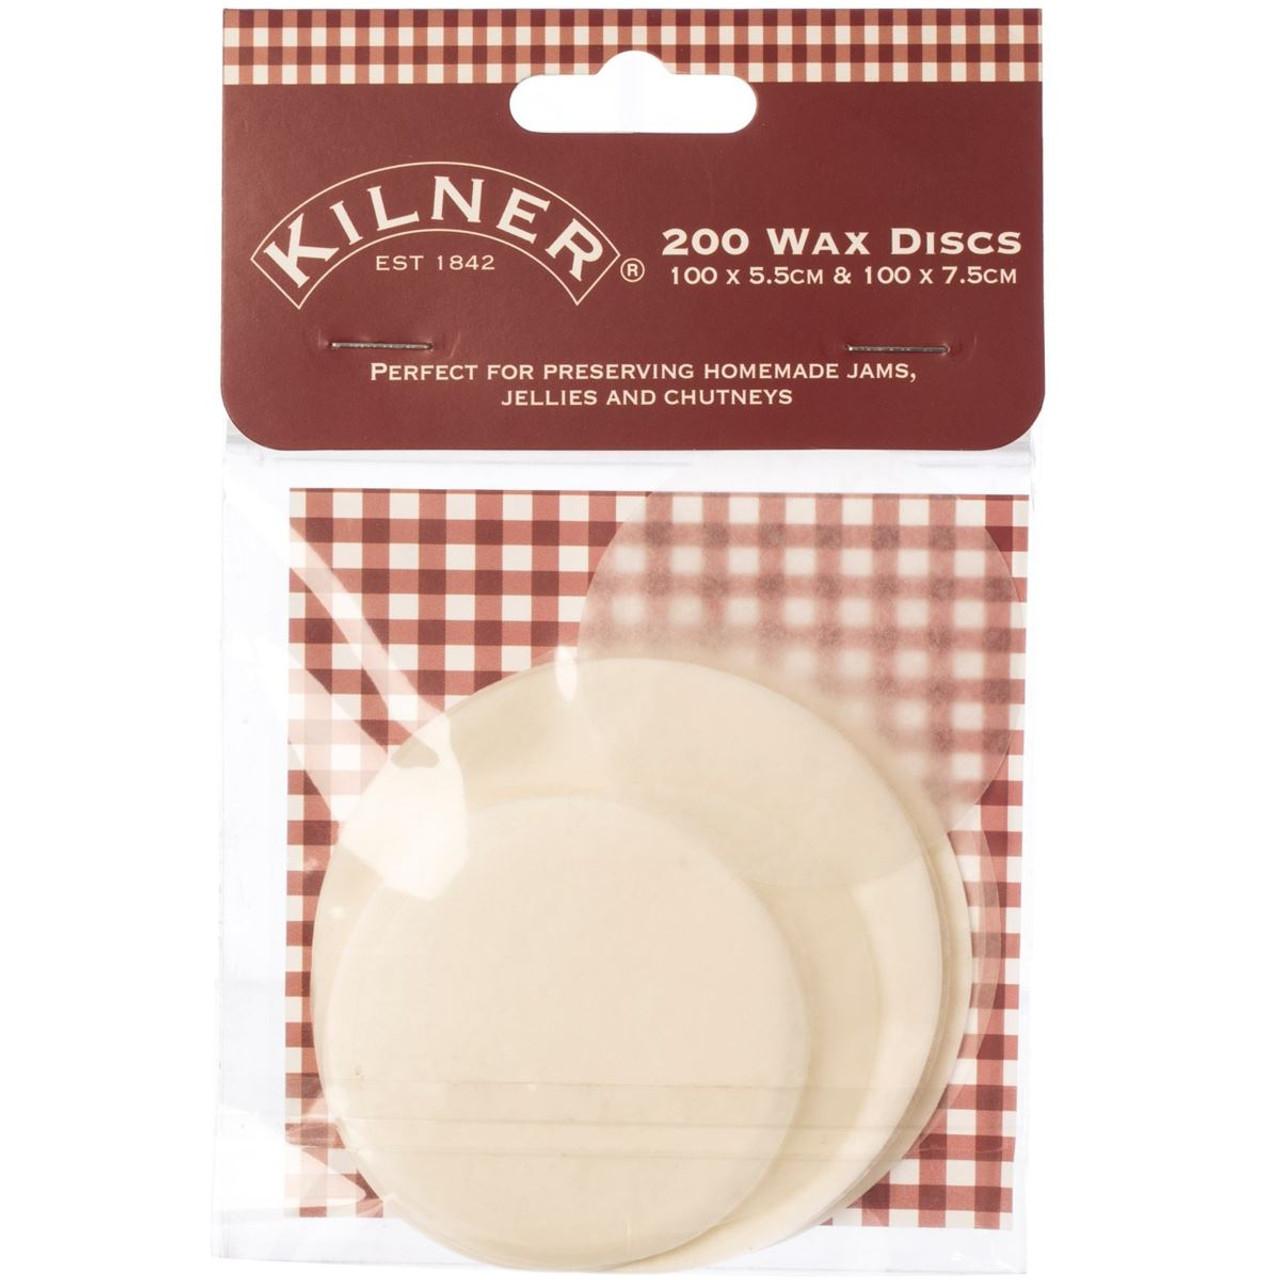 Kilner Pack of 200 Wax Discs